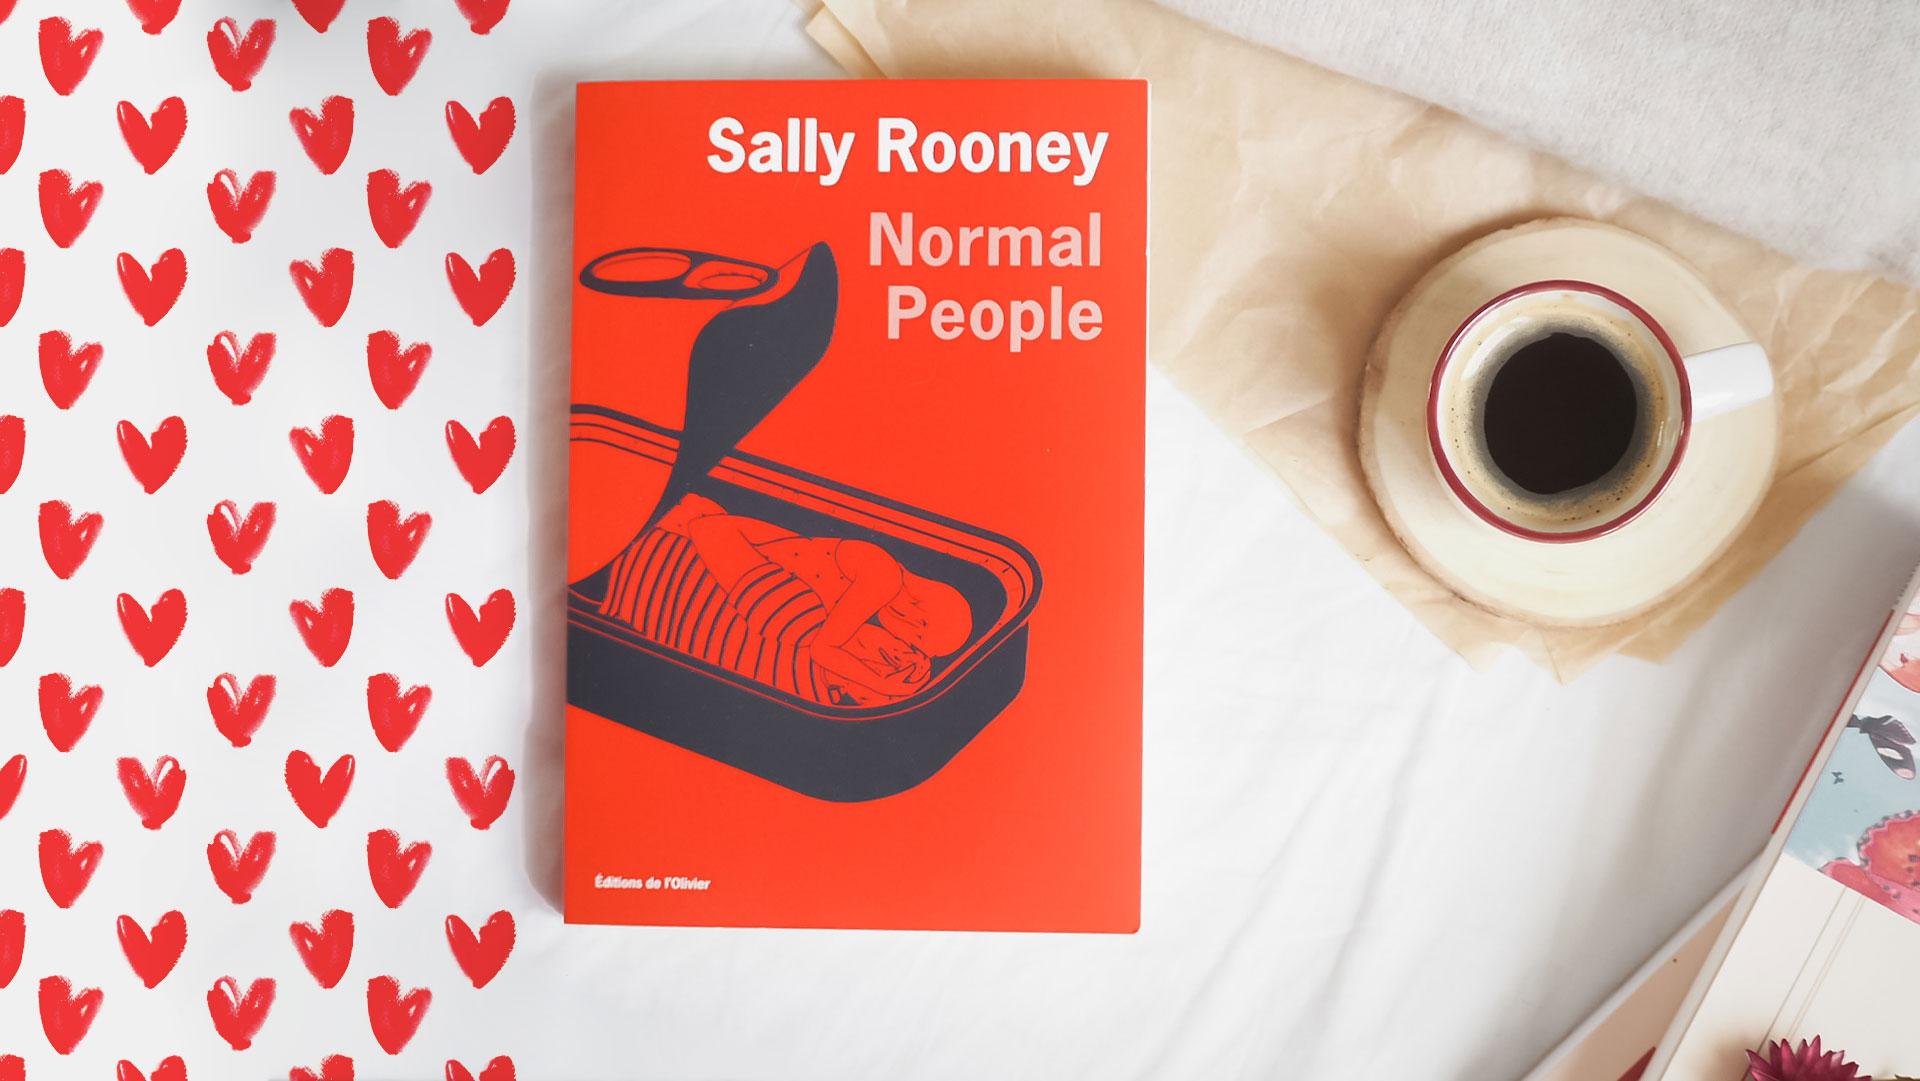 Normal-People-Sally-Rooney